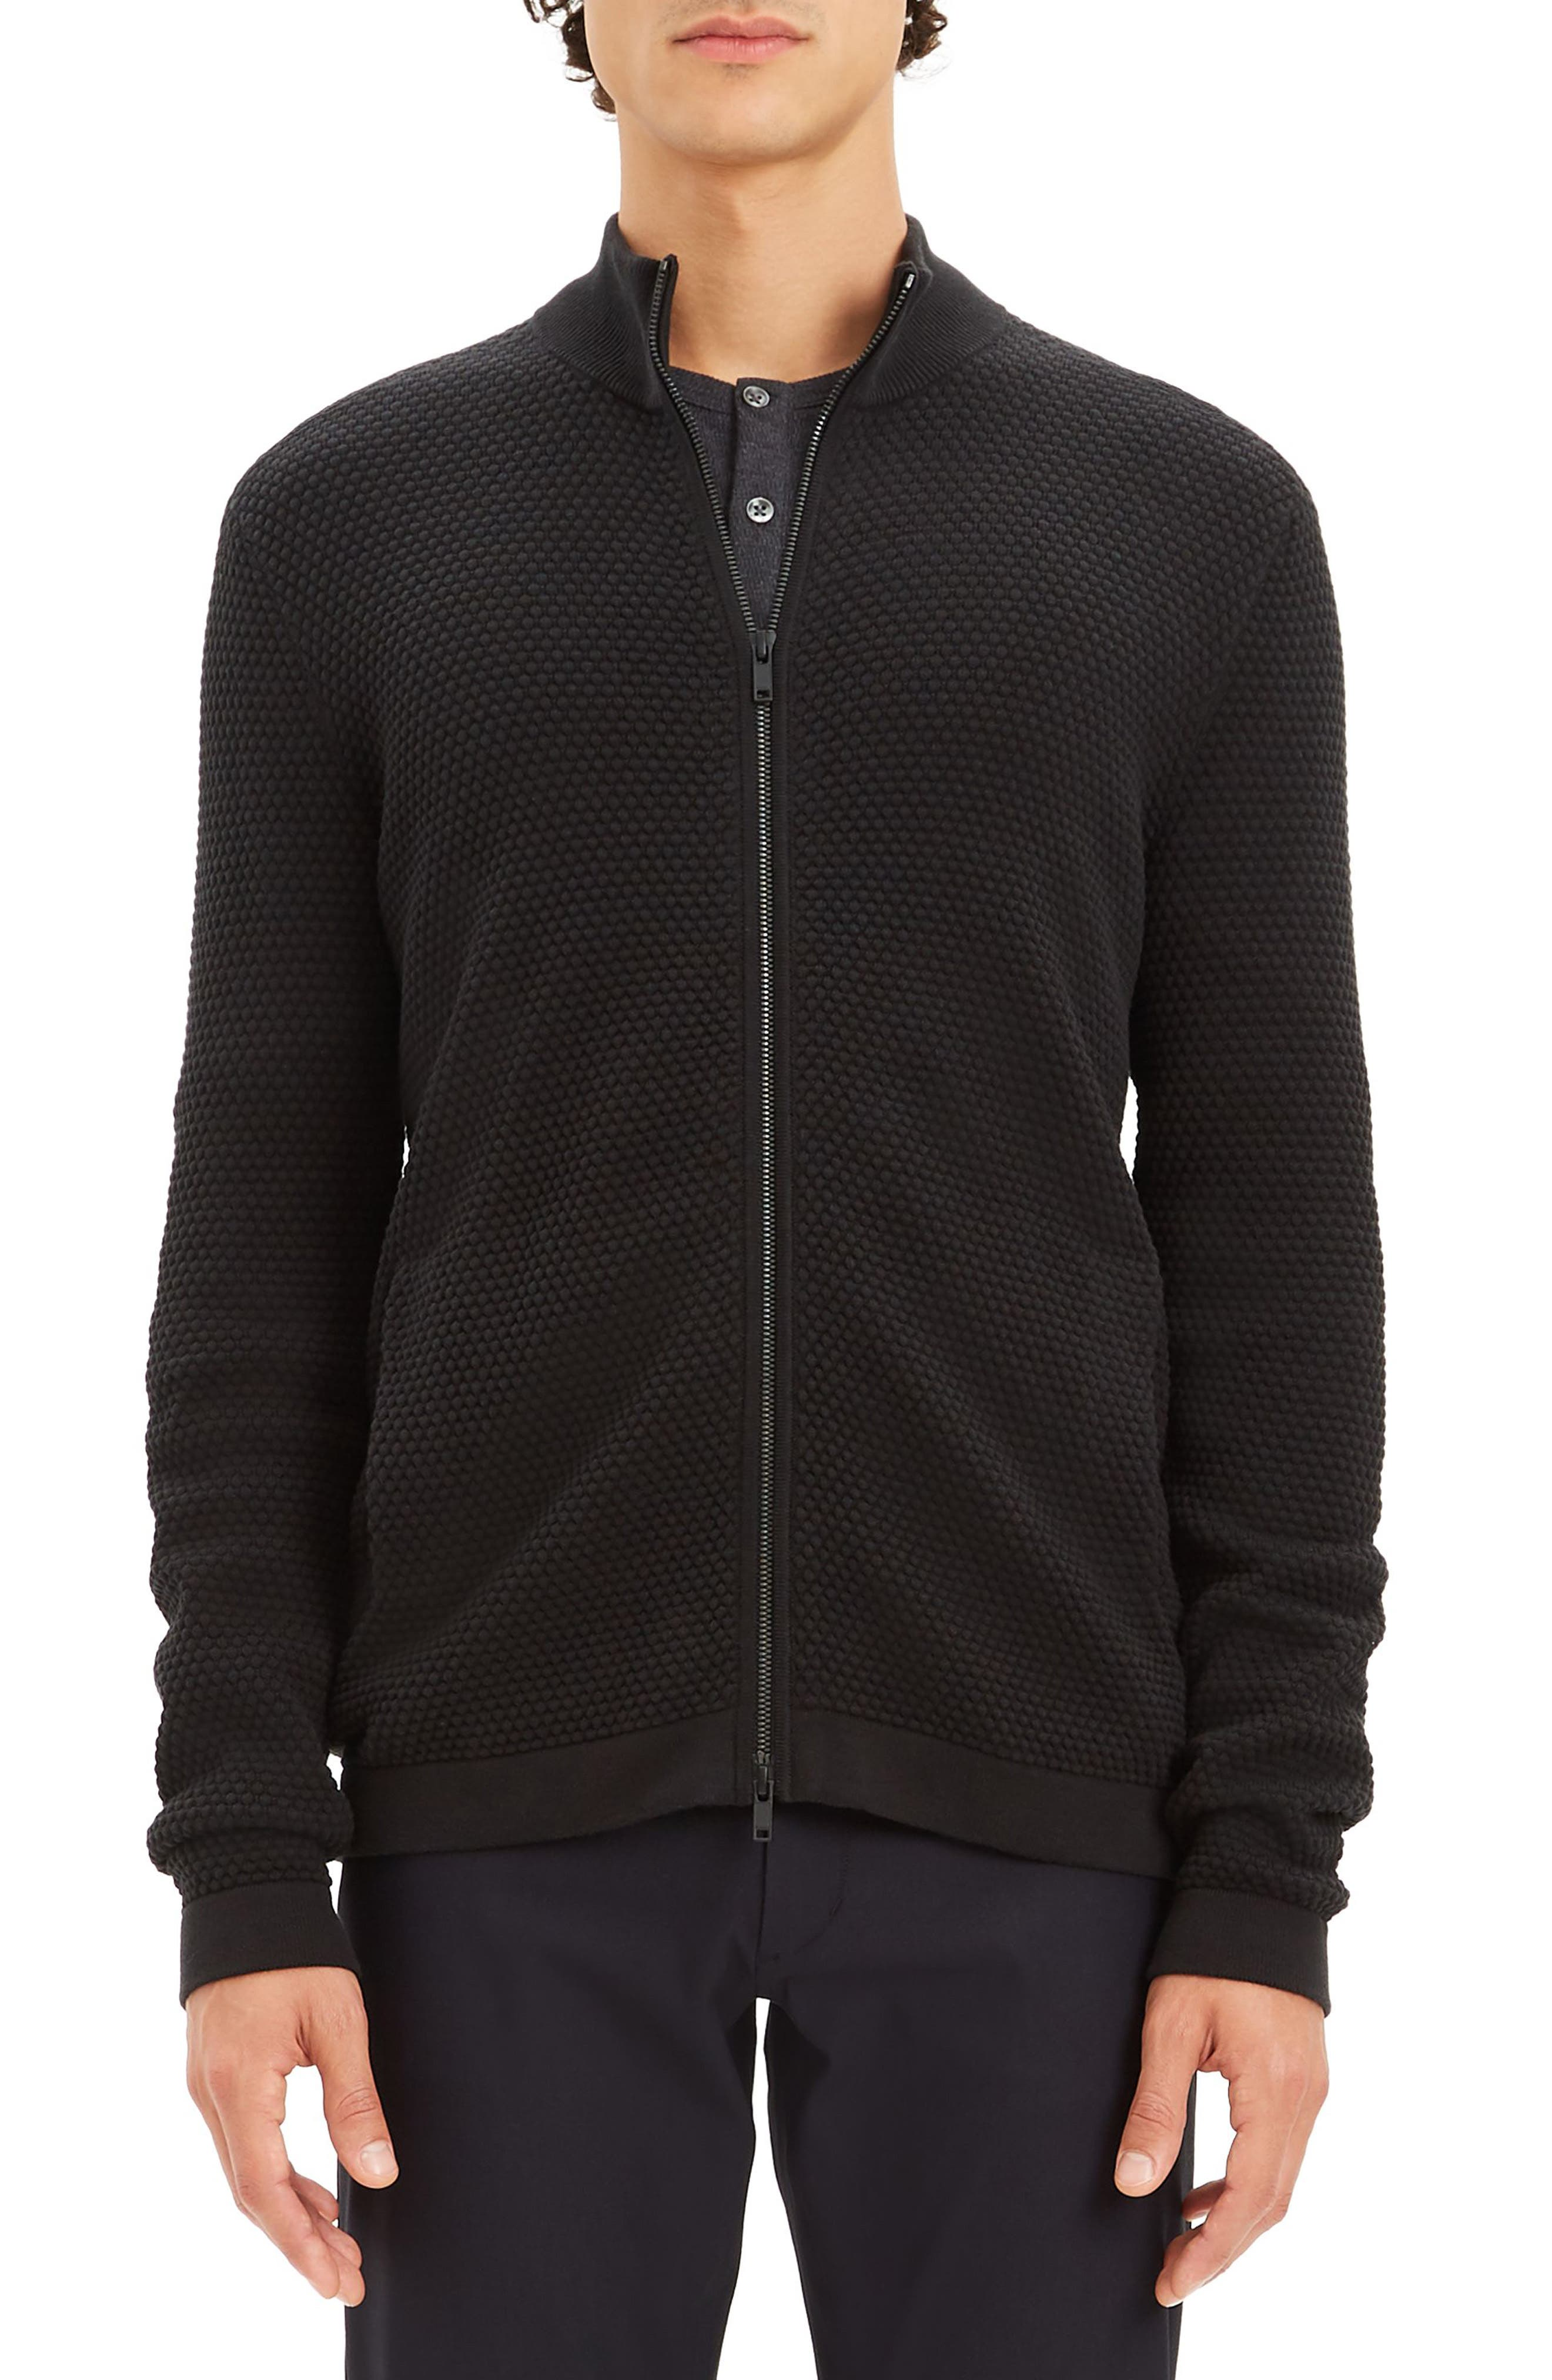 Udeval Breach Regular Fit Zip Sweater,                         Main,                         color, BLACK